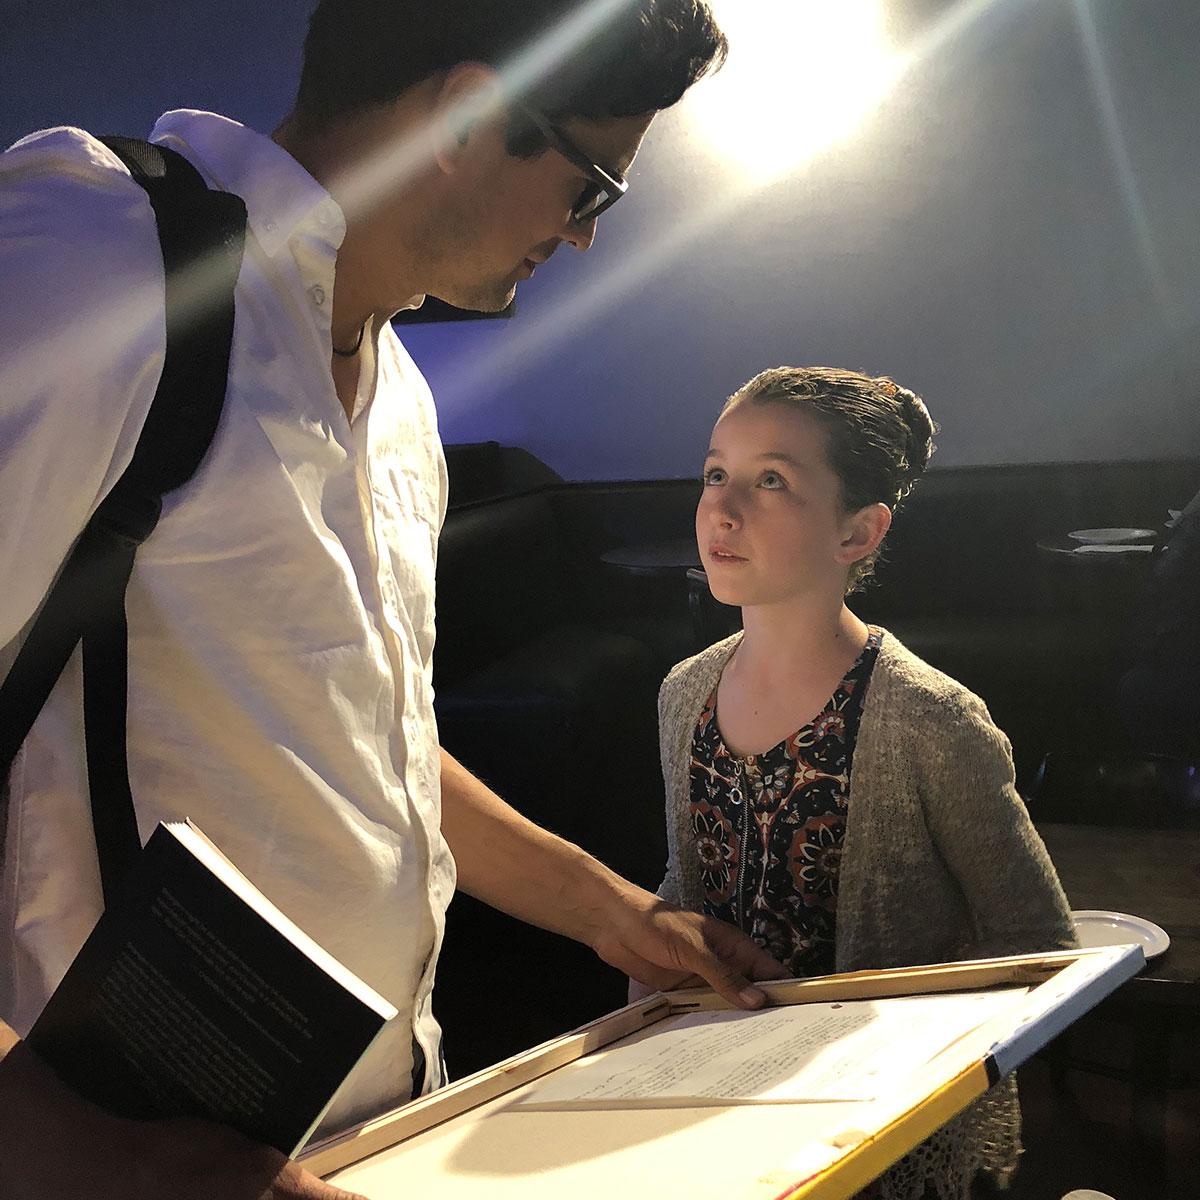 John Black PS student Eliina presents a painting to author David Robertson, May 14, 2018.